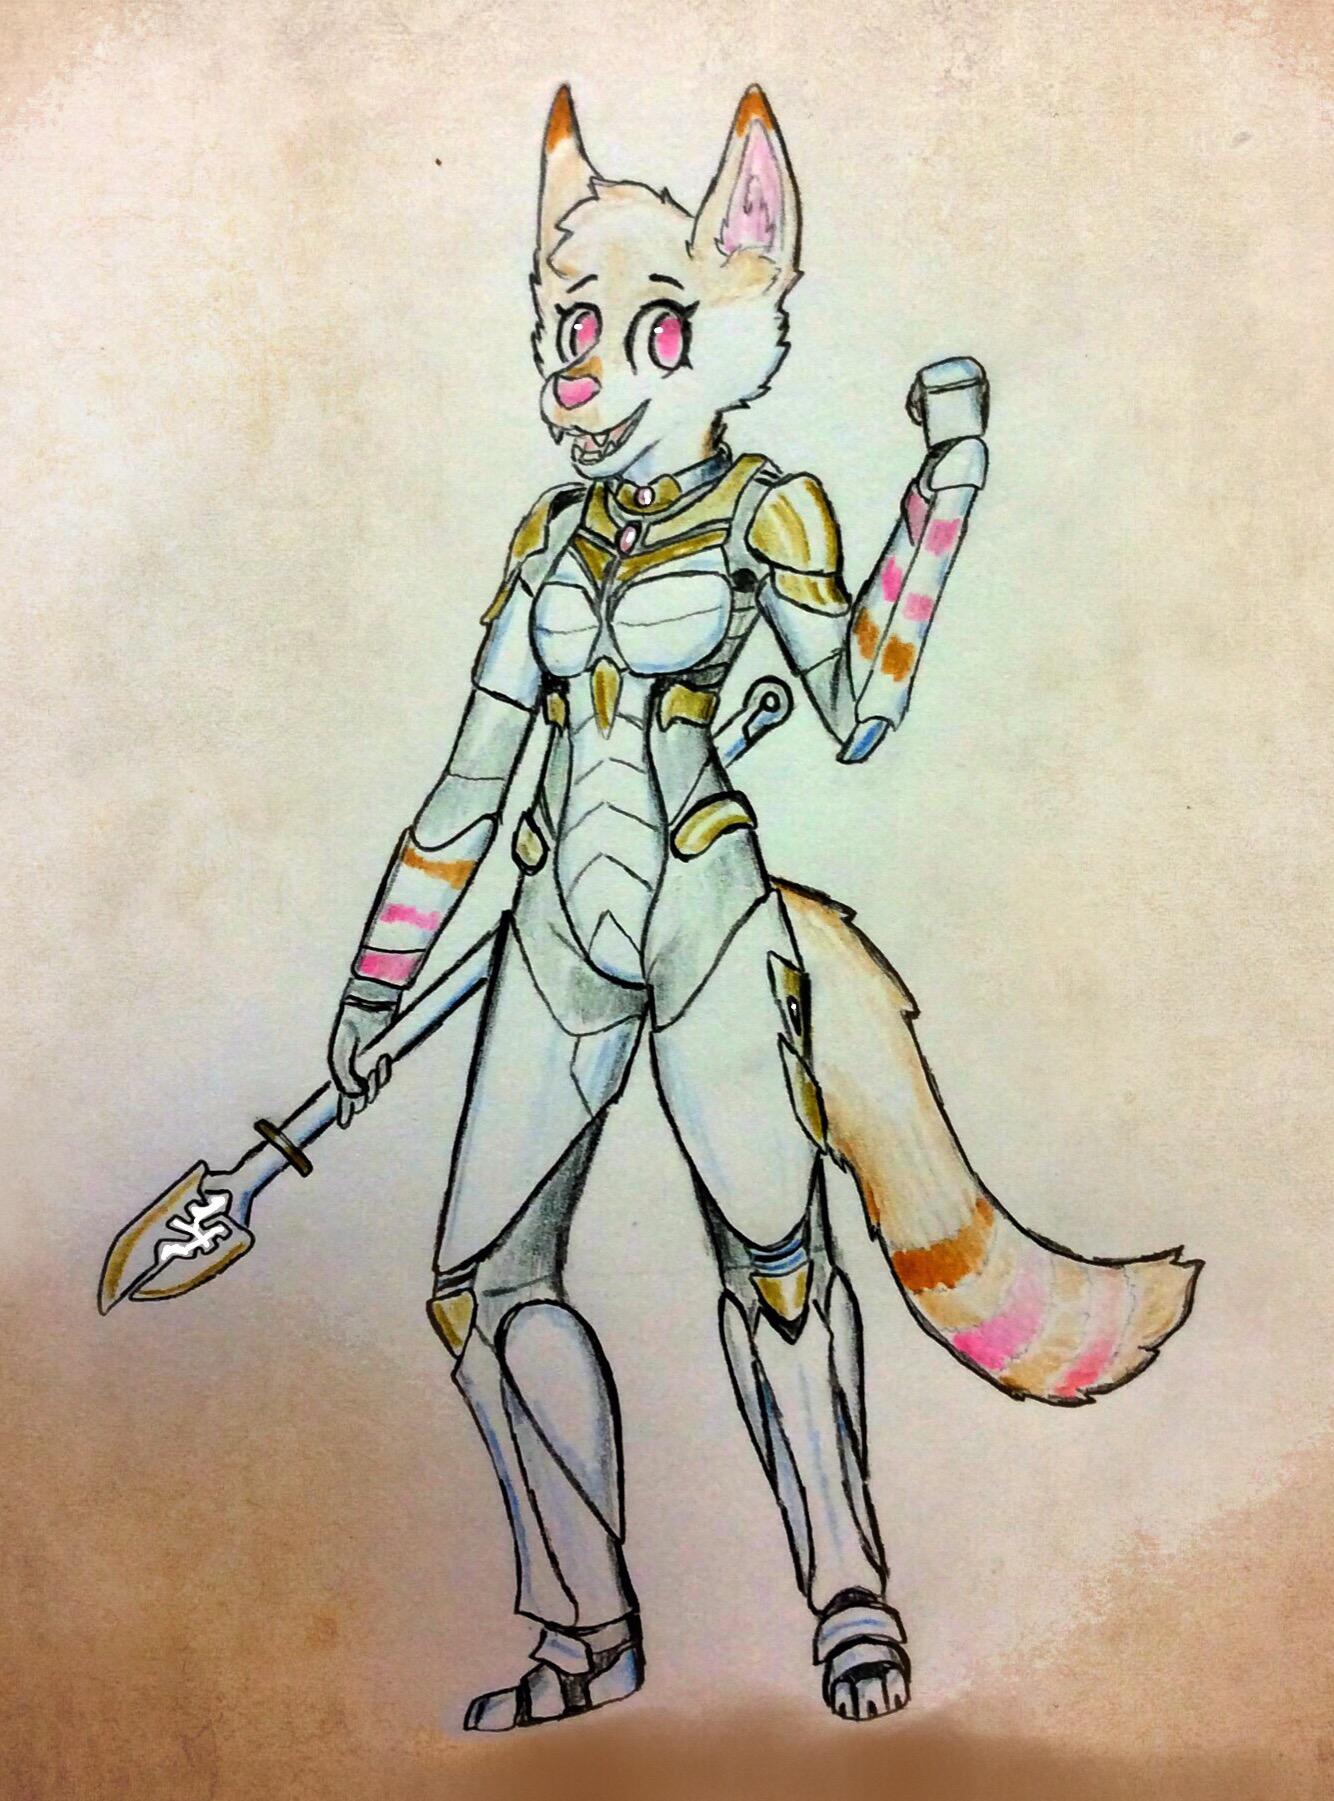 Phobee's scifi armor